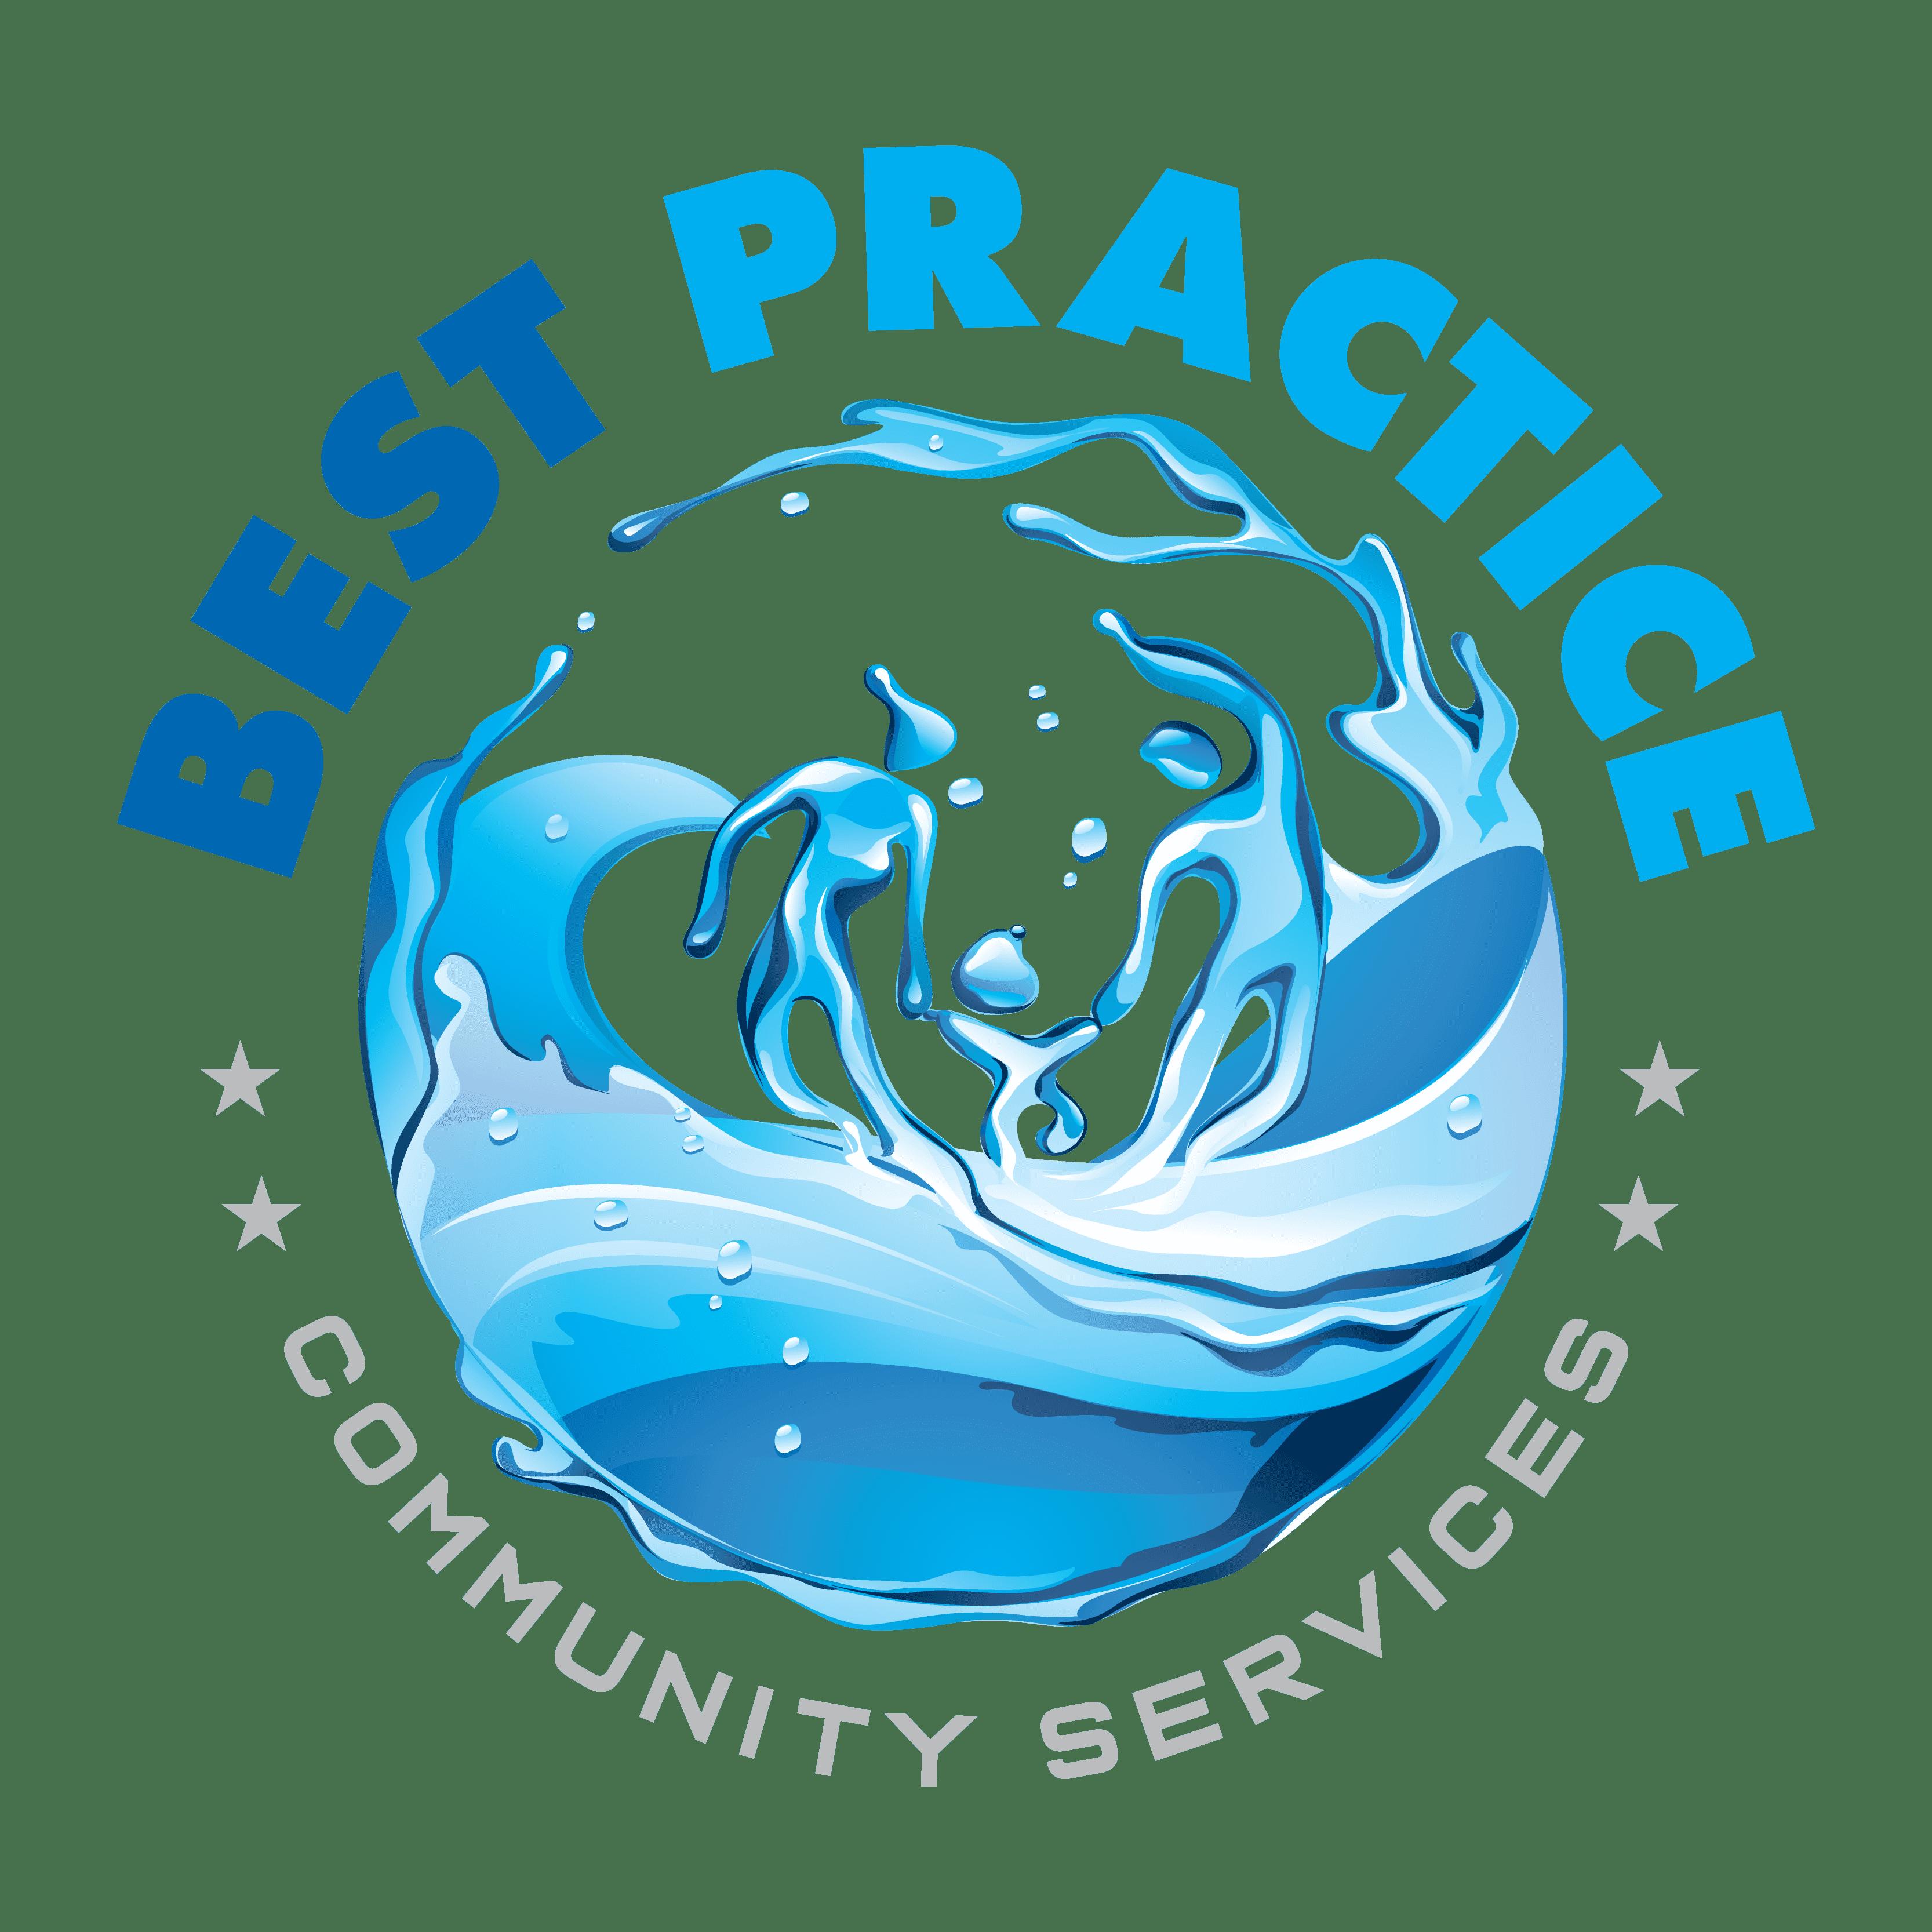 Best Practice Community Services Logo